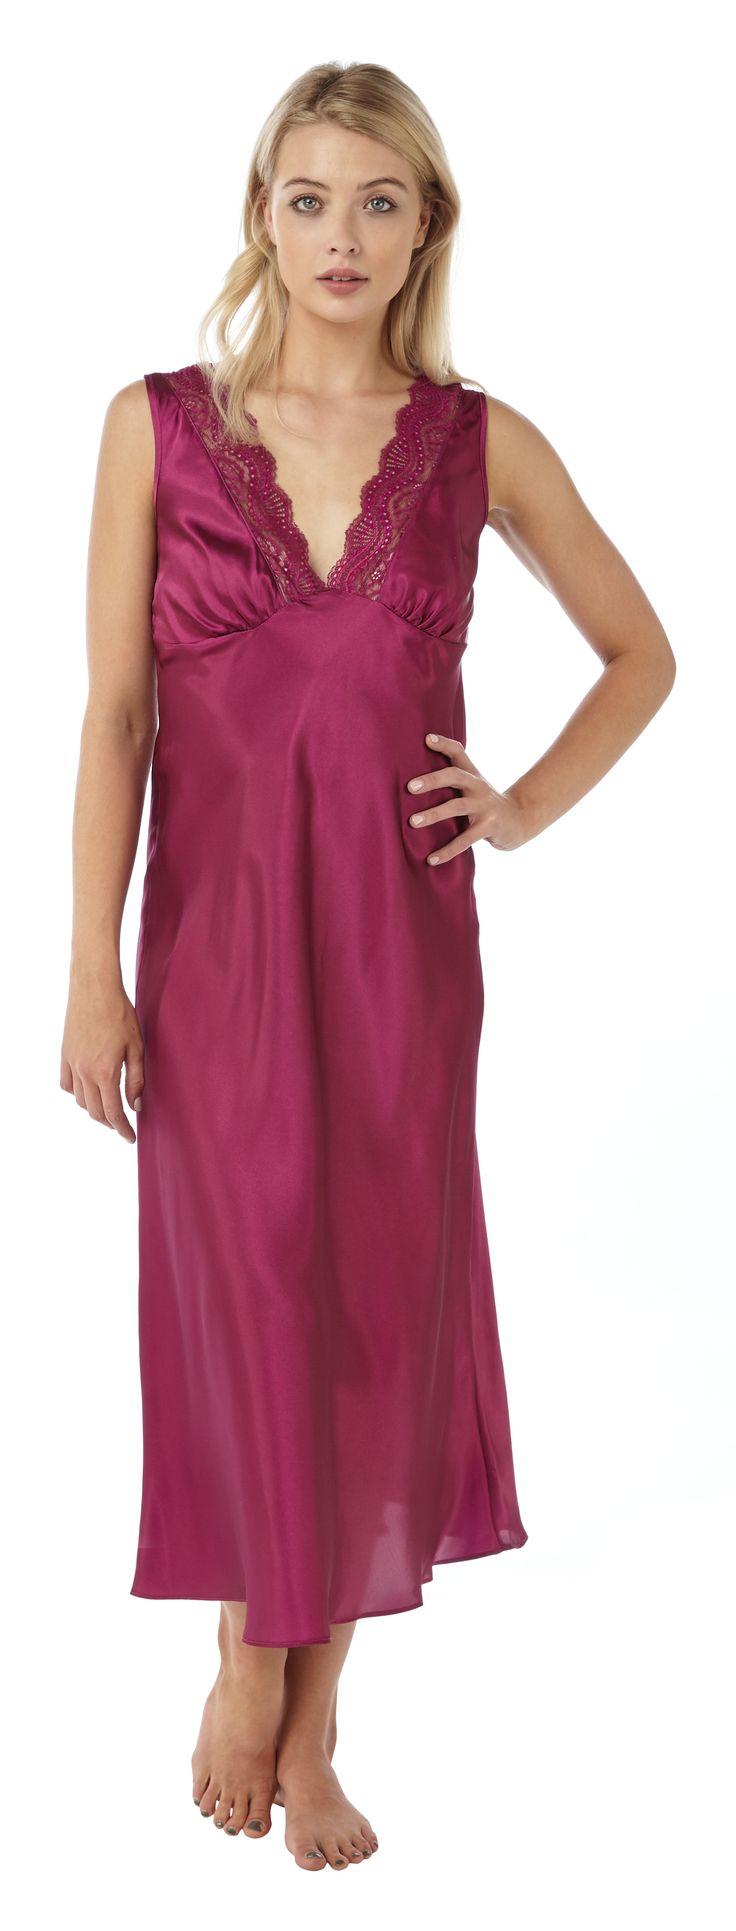 Full length long pink purple plain satin nightdress plus